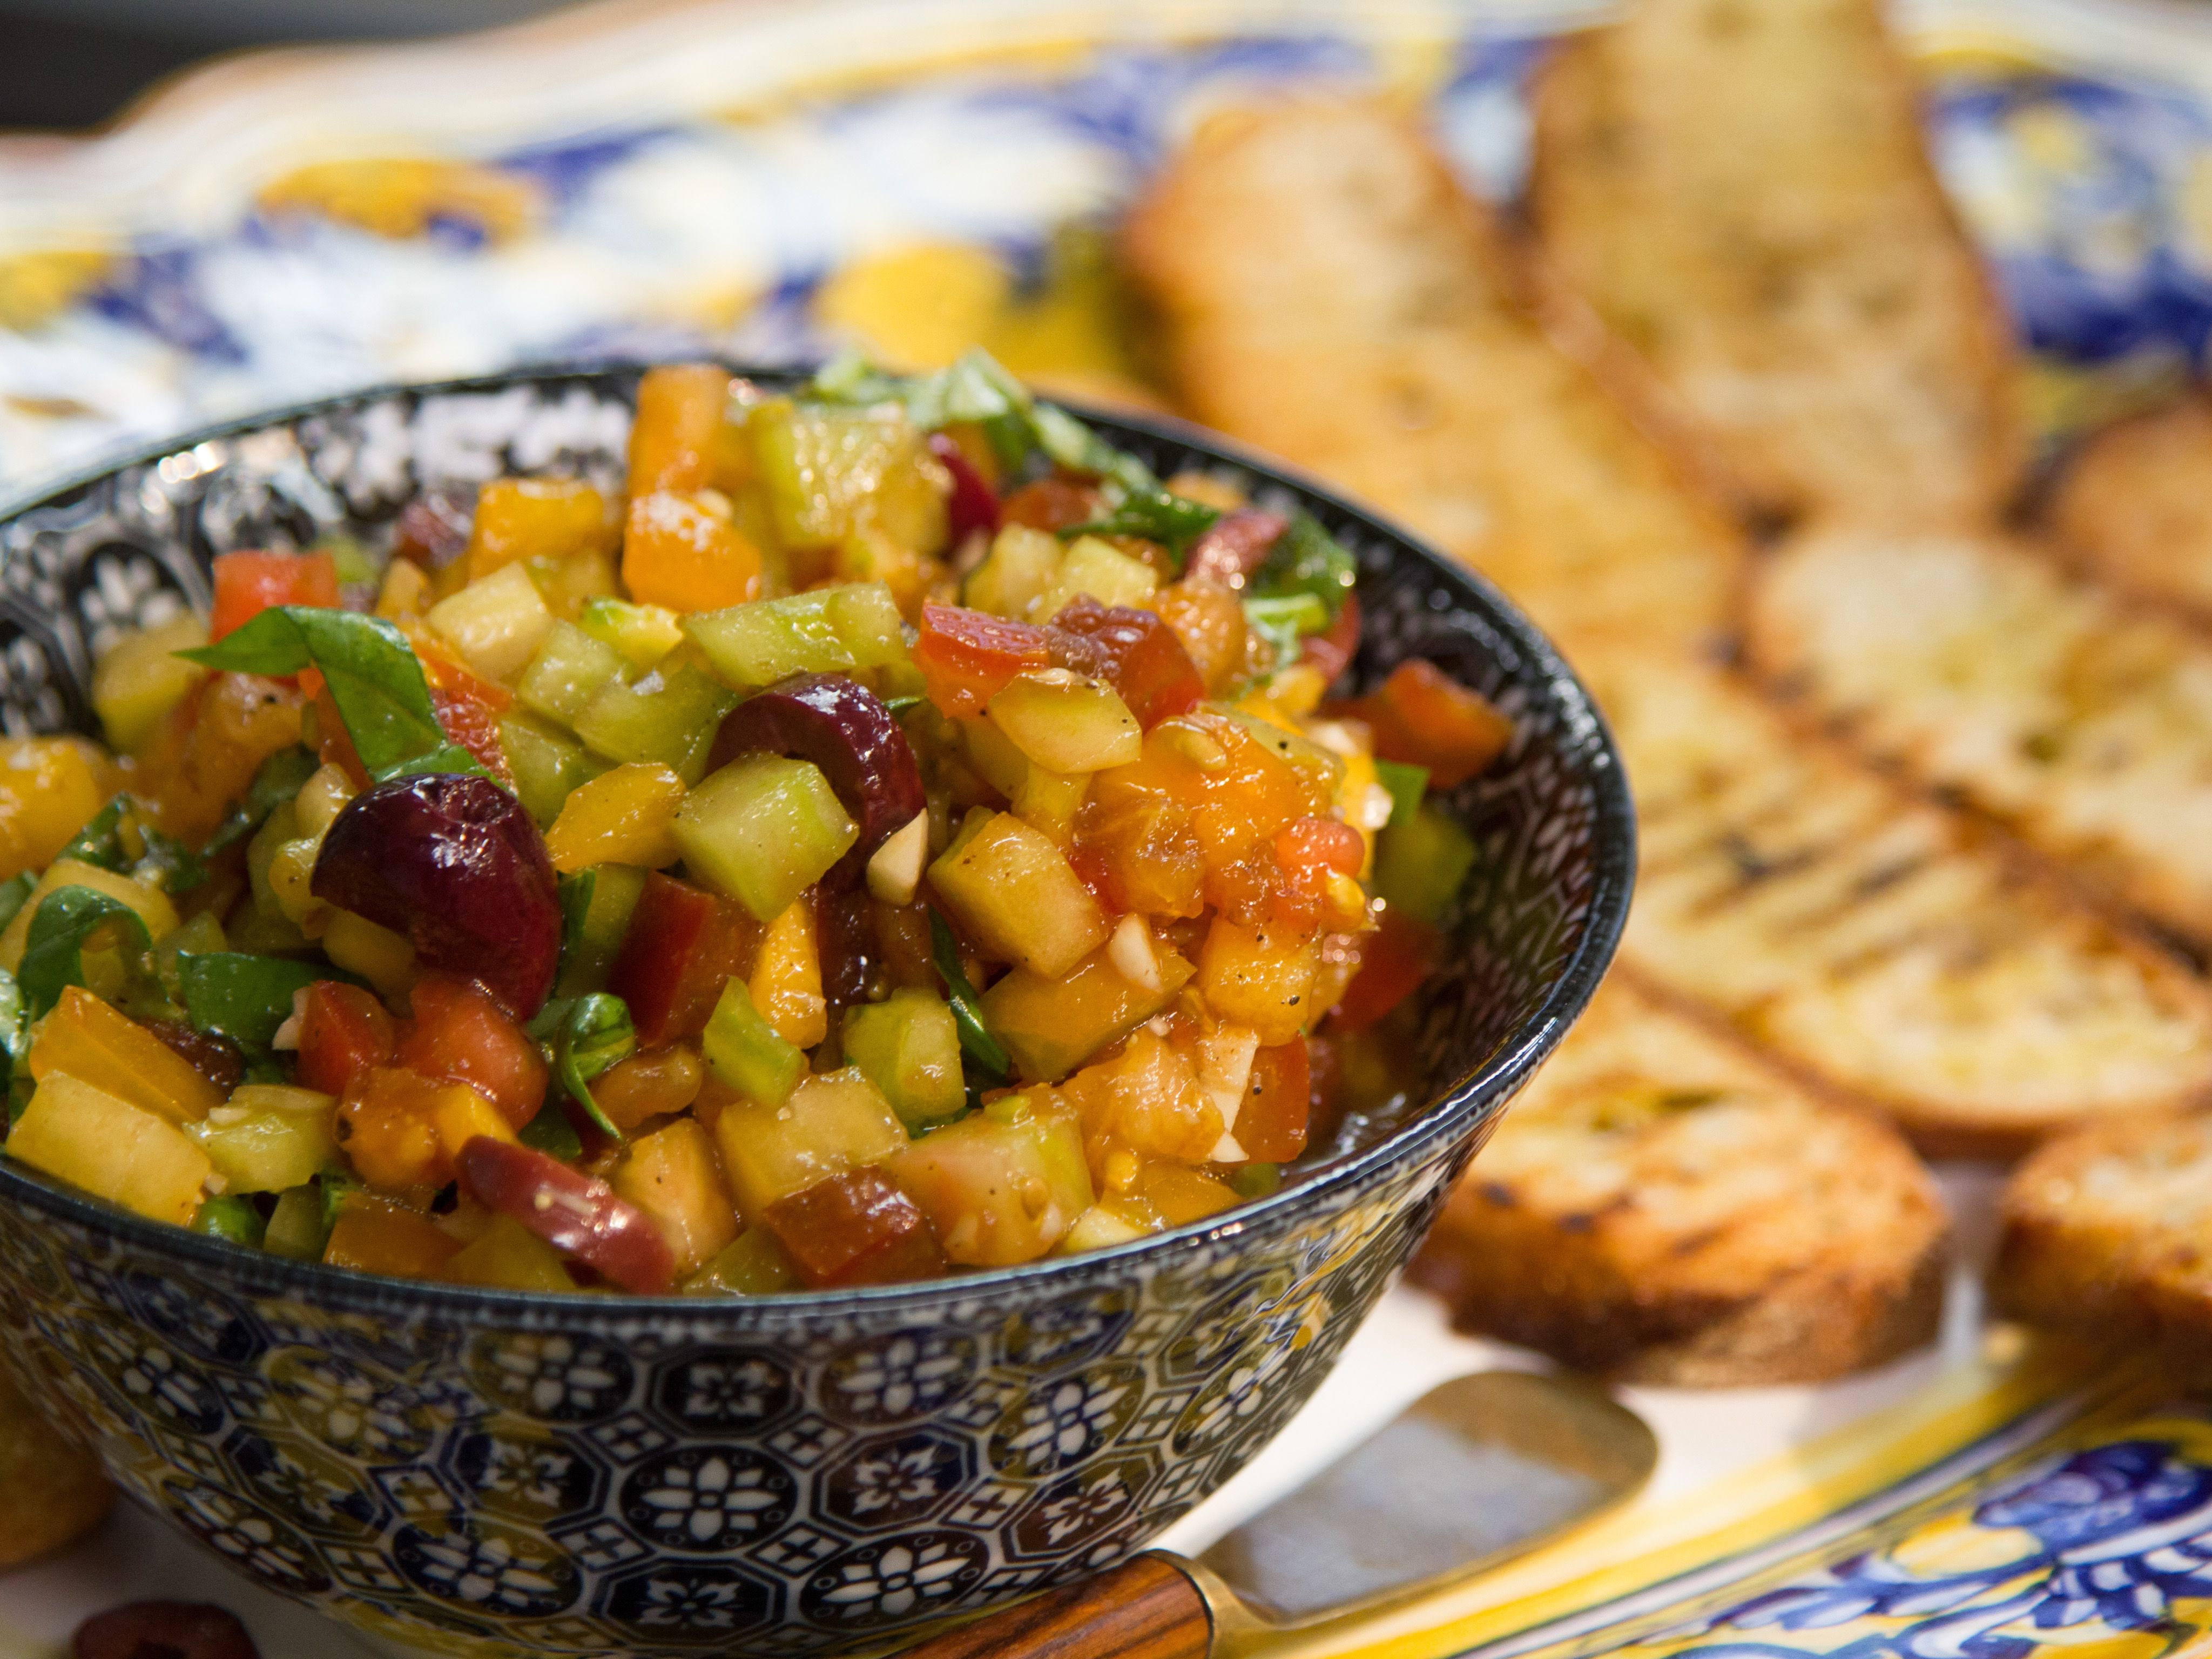 Tomato bruschetta valerie style recipe valerie bertinelli dips forumfinder Choice Image